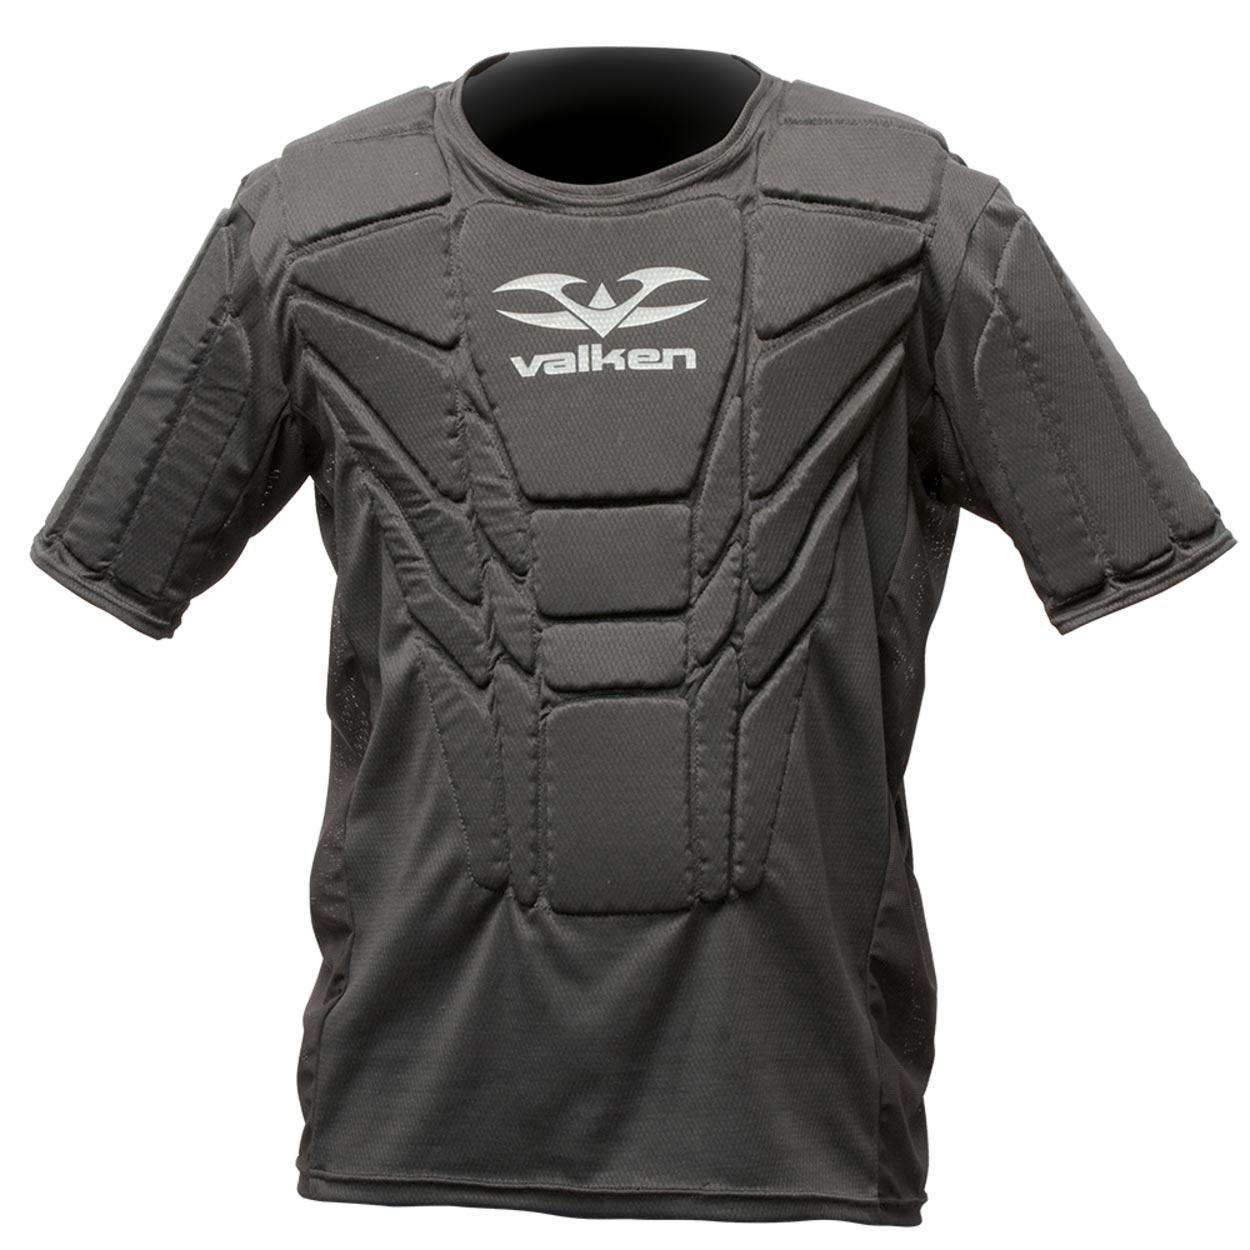 Valken PadImpact Shirt Chest Upper Body Chest S/M